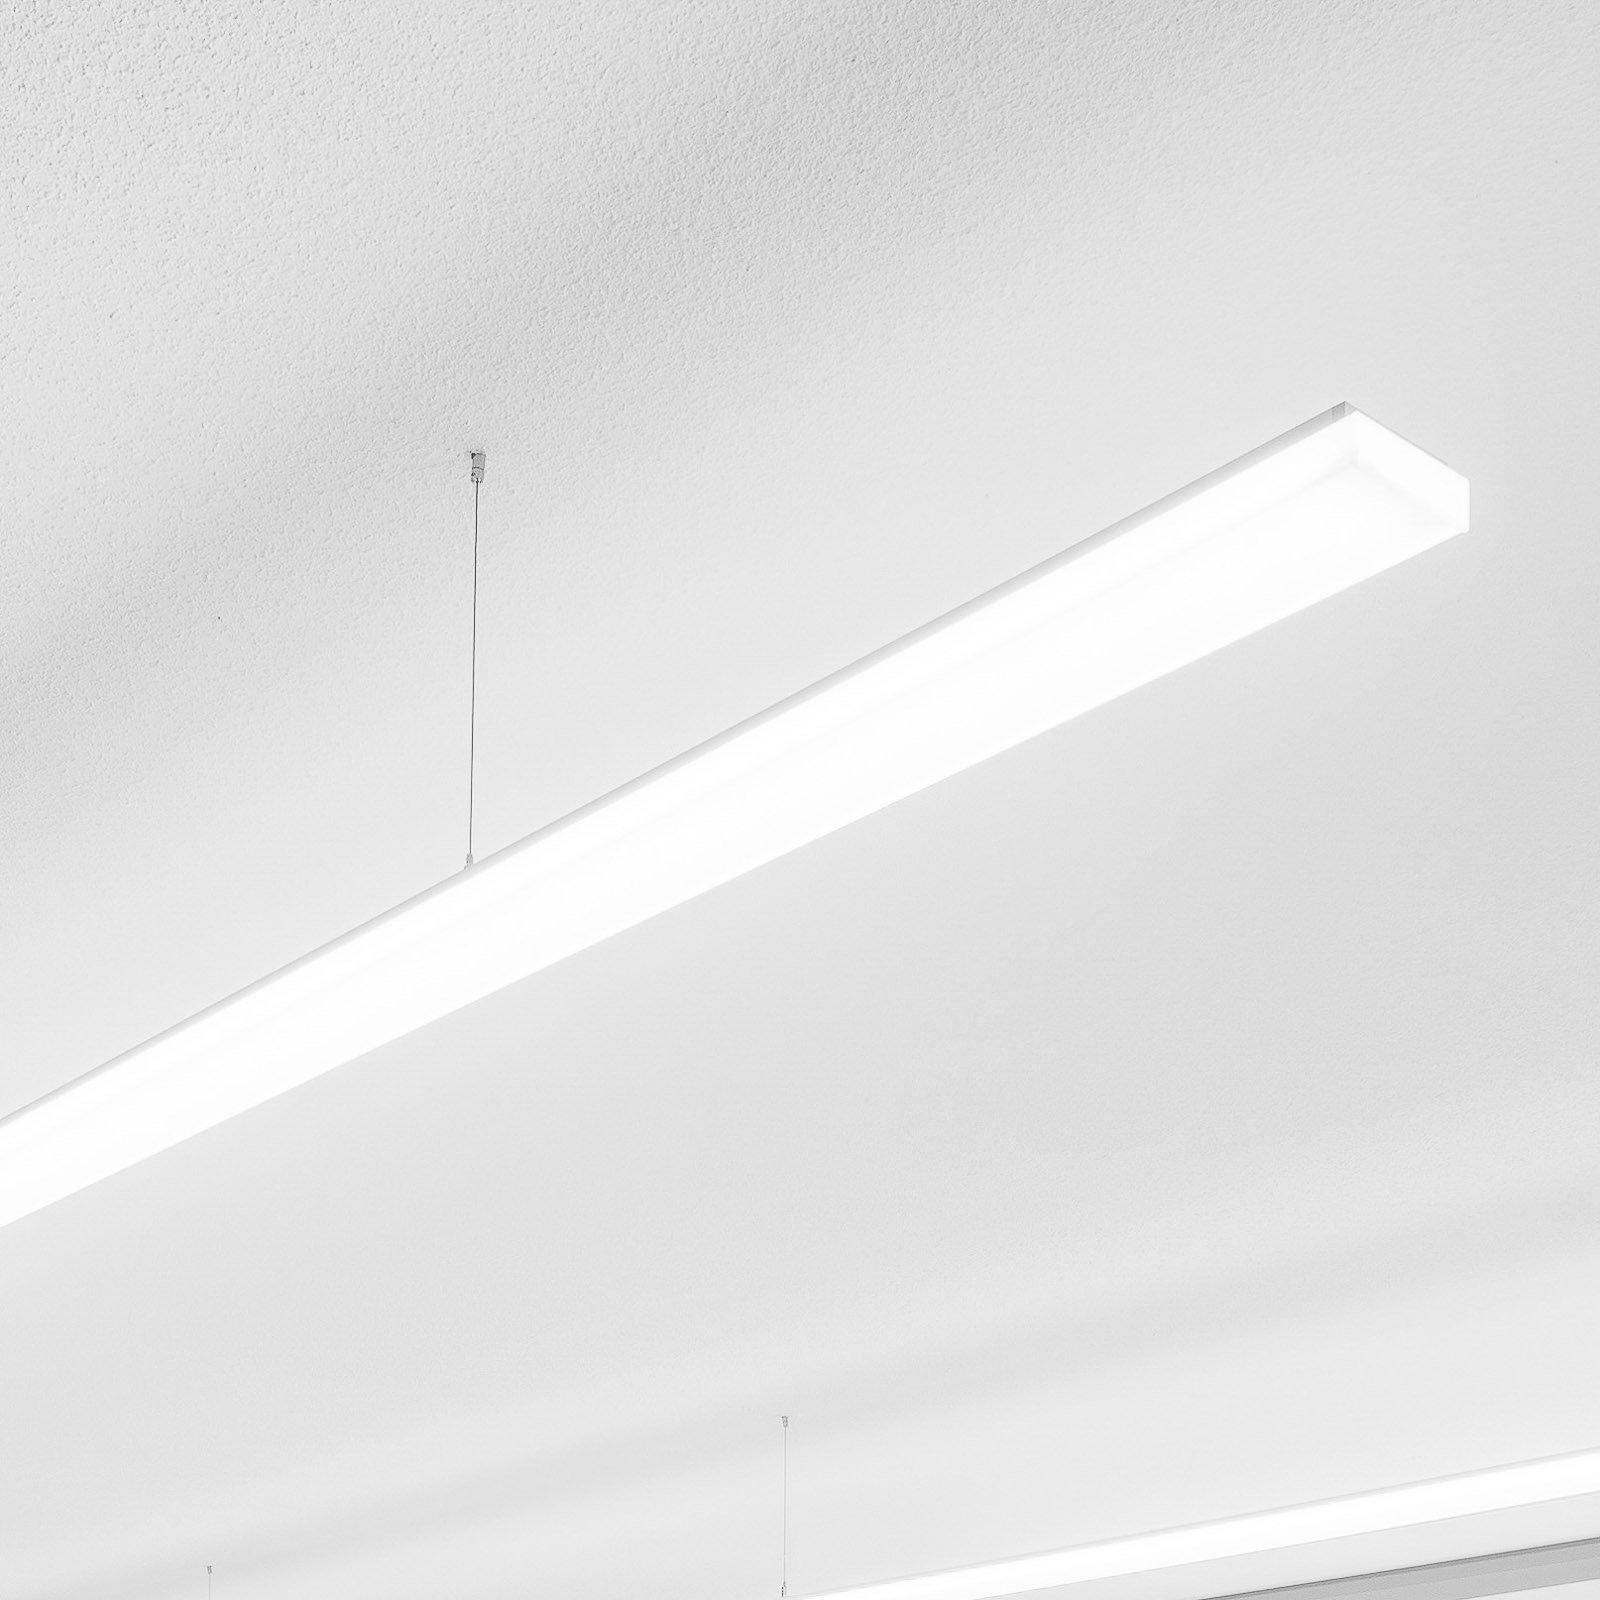 Regent Purelite Office taklampe 123,1 cm 4 000 K